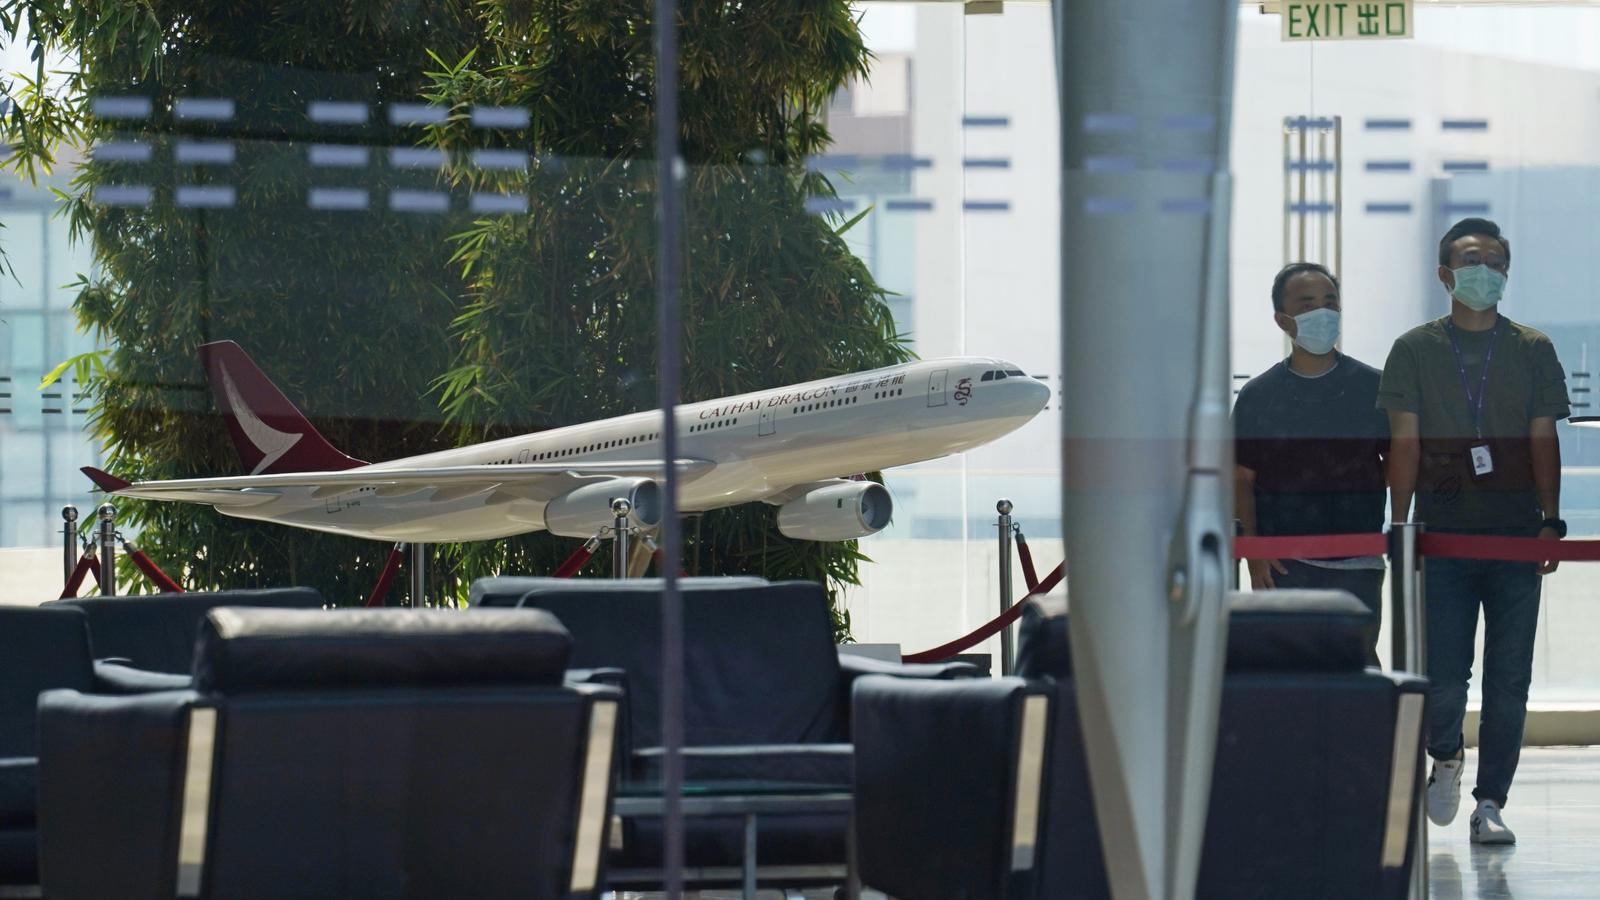 United Airlines' CommonPass works to restart international air travel